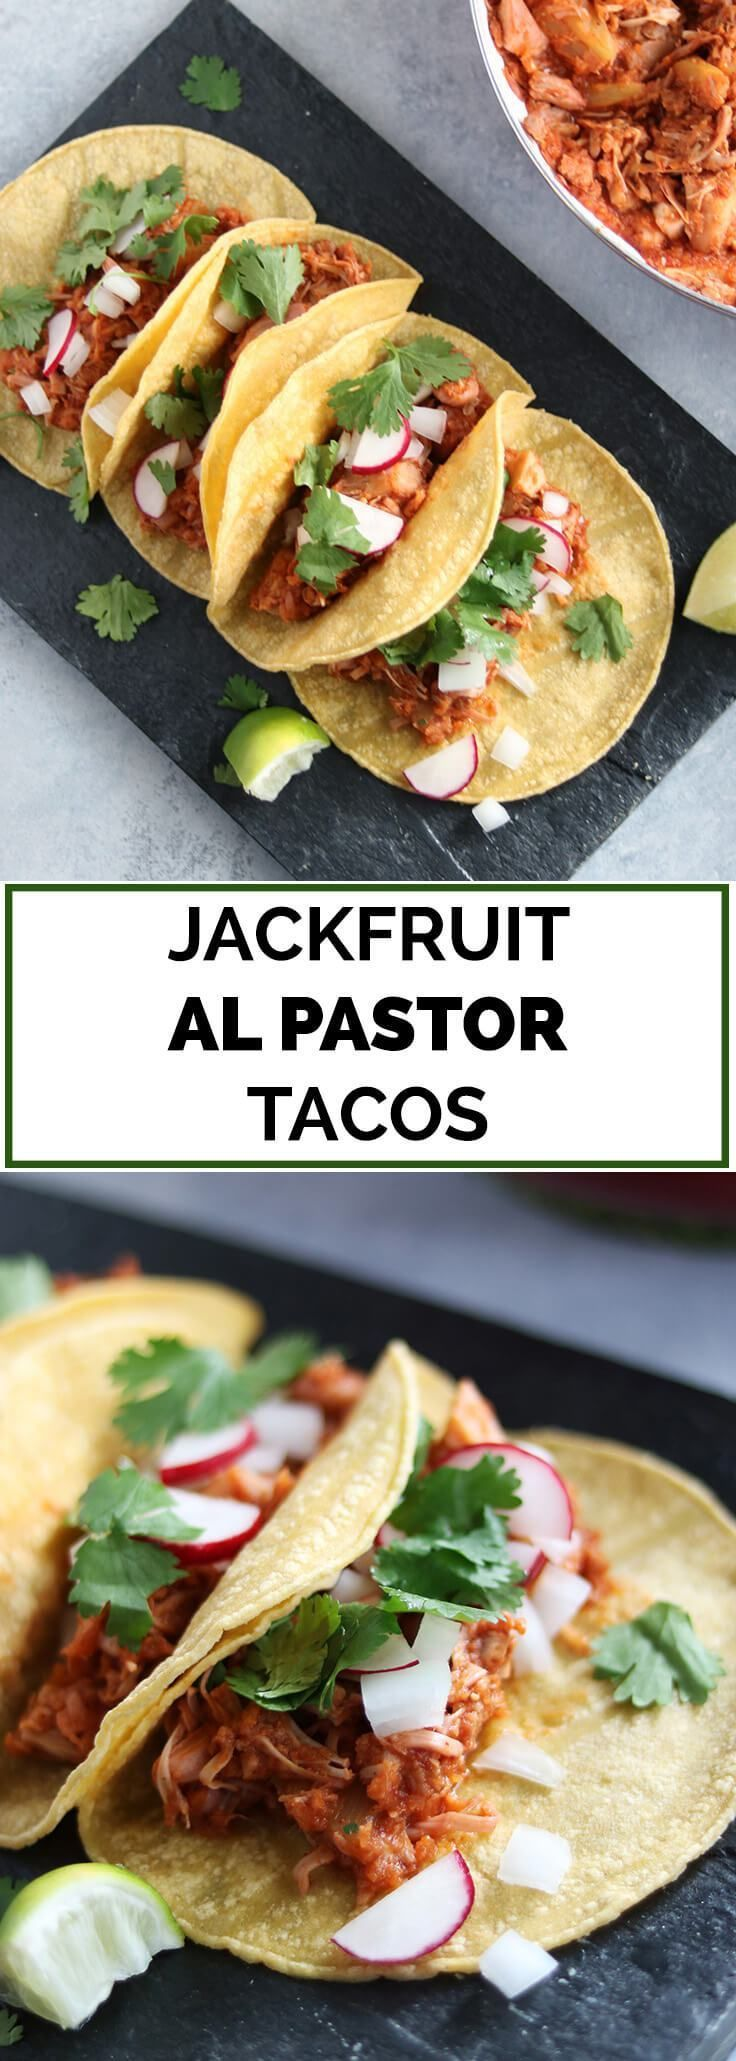 Jackfruit Al Pastor Tacos